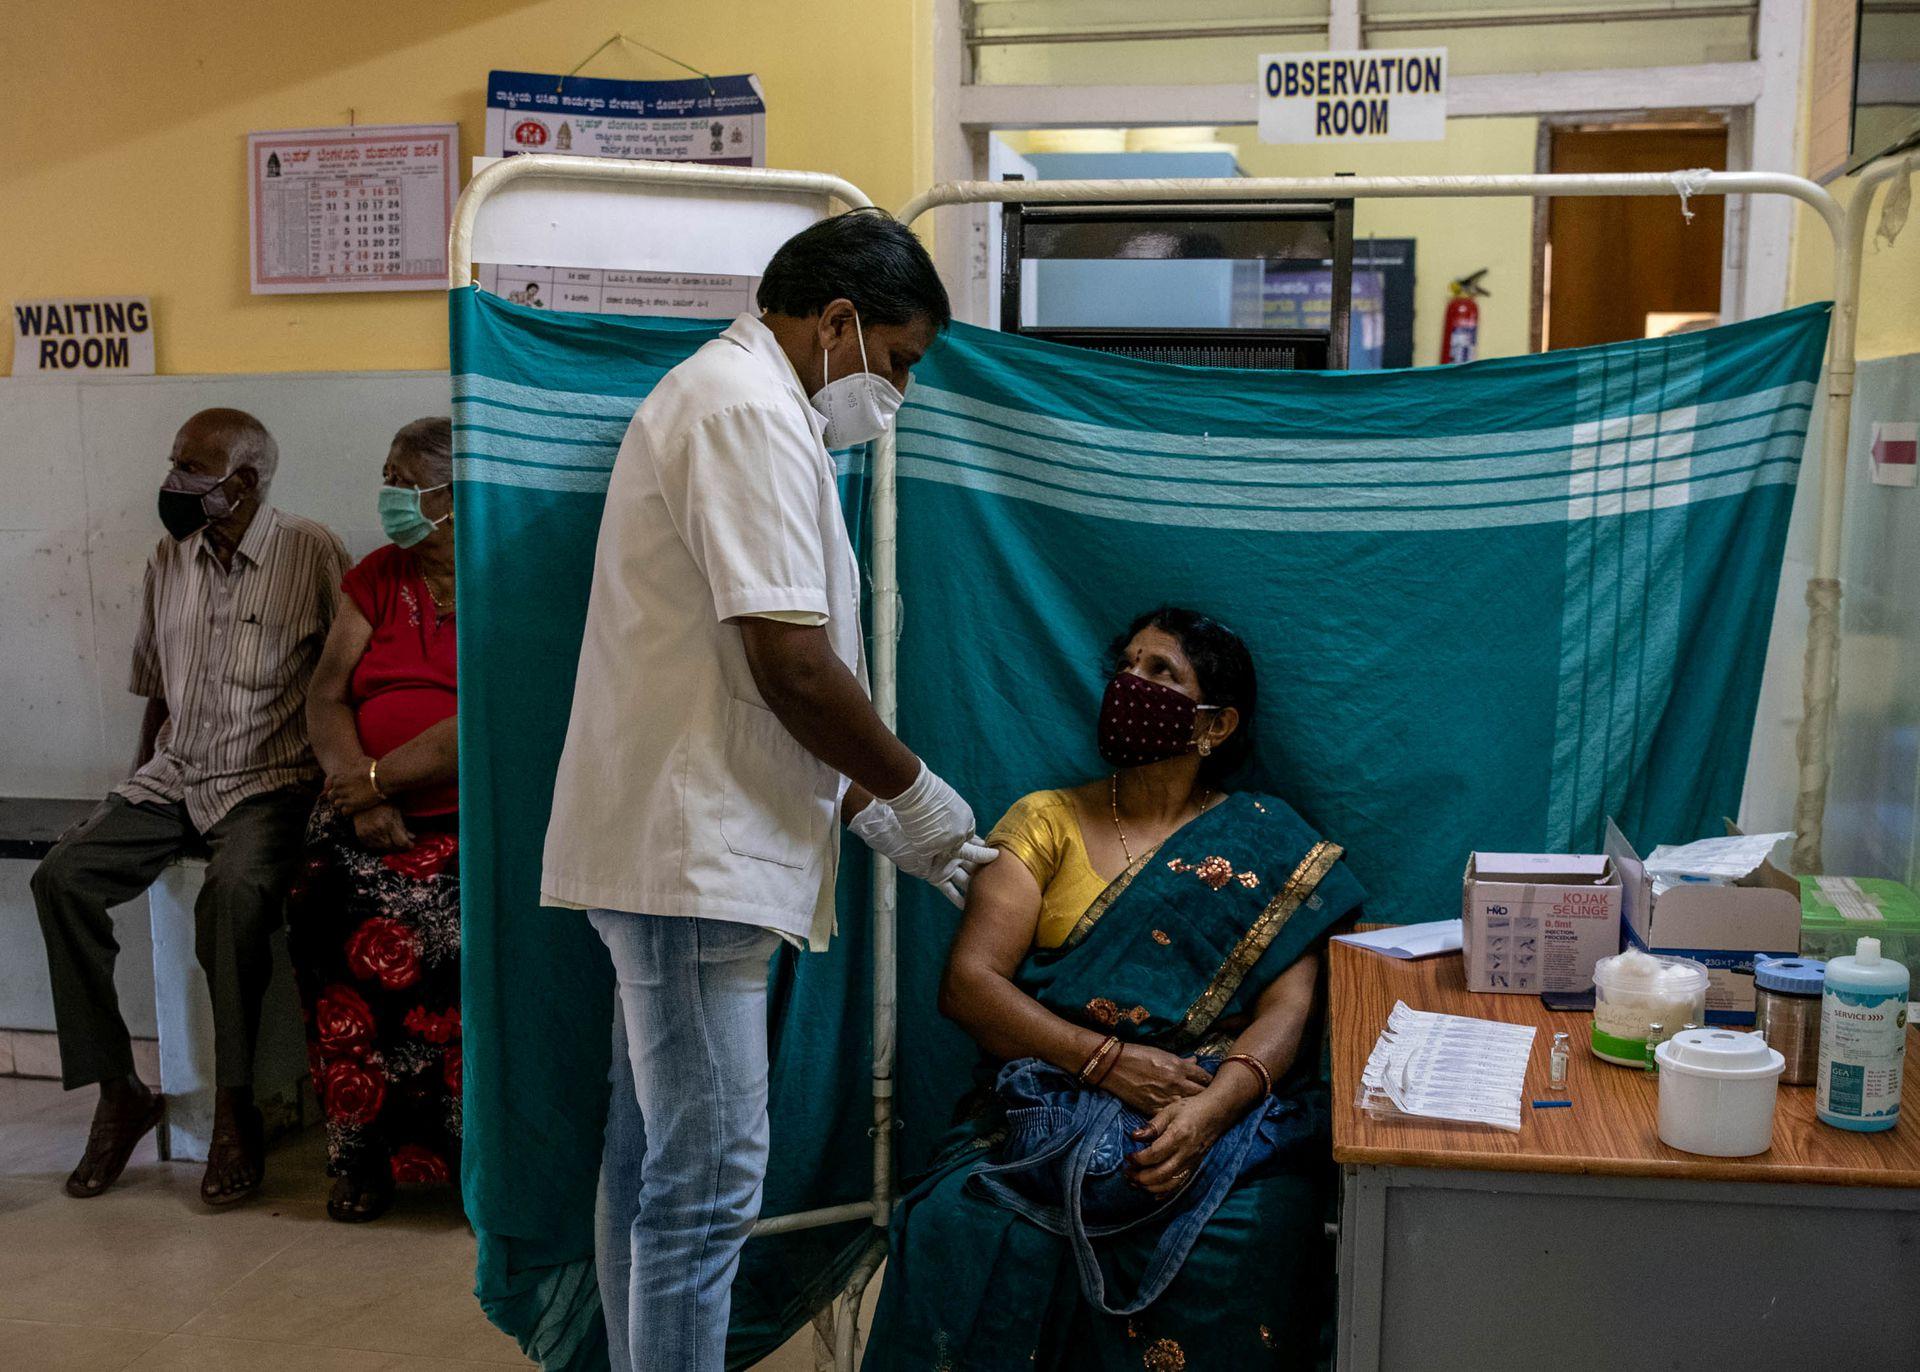 Minakshamma, 68, receives a dose of COVISHIELD, a coronavirus disease (COVID-19) vaccine manufactured by Serum Institute of India, at a vaccination centre in Bengaluru, May 13, 2021. Photo: Reuters